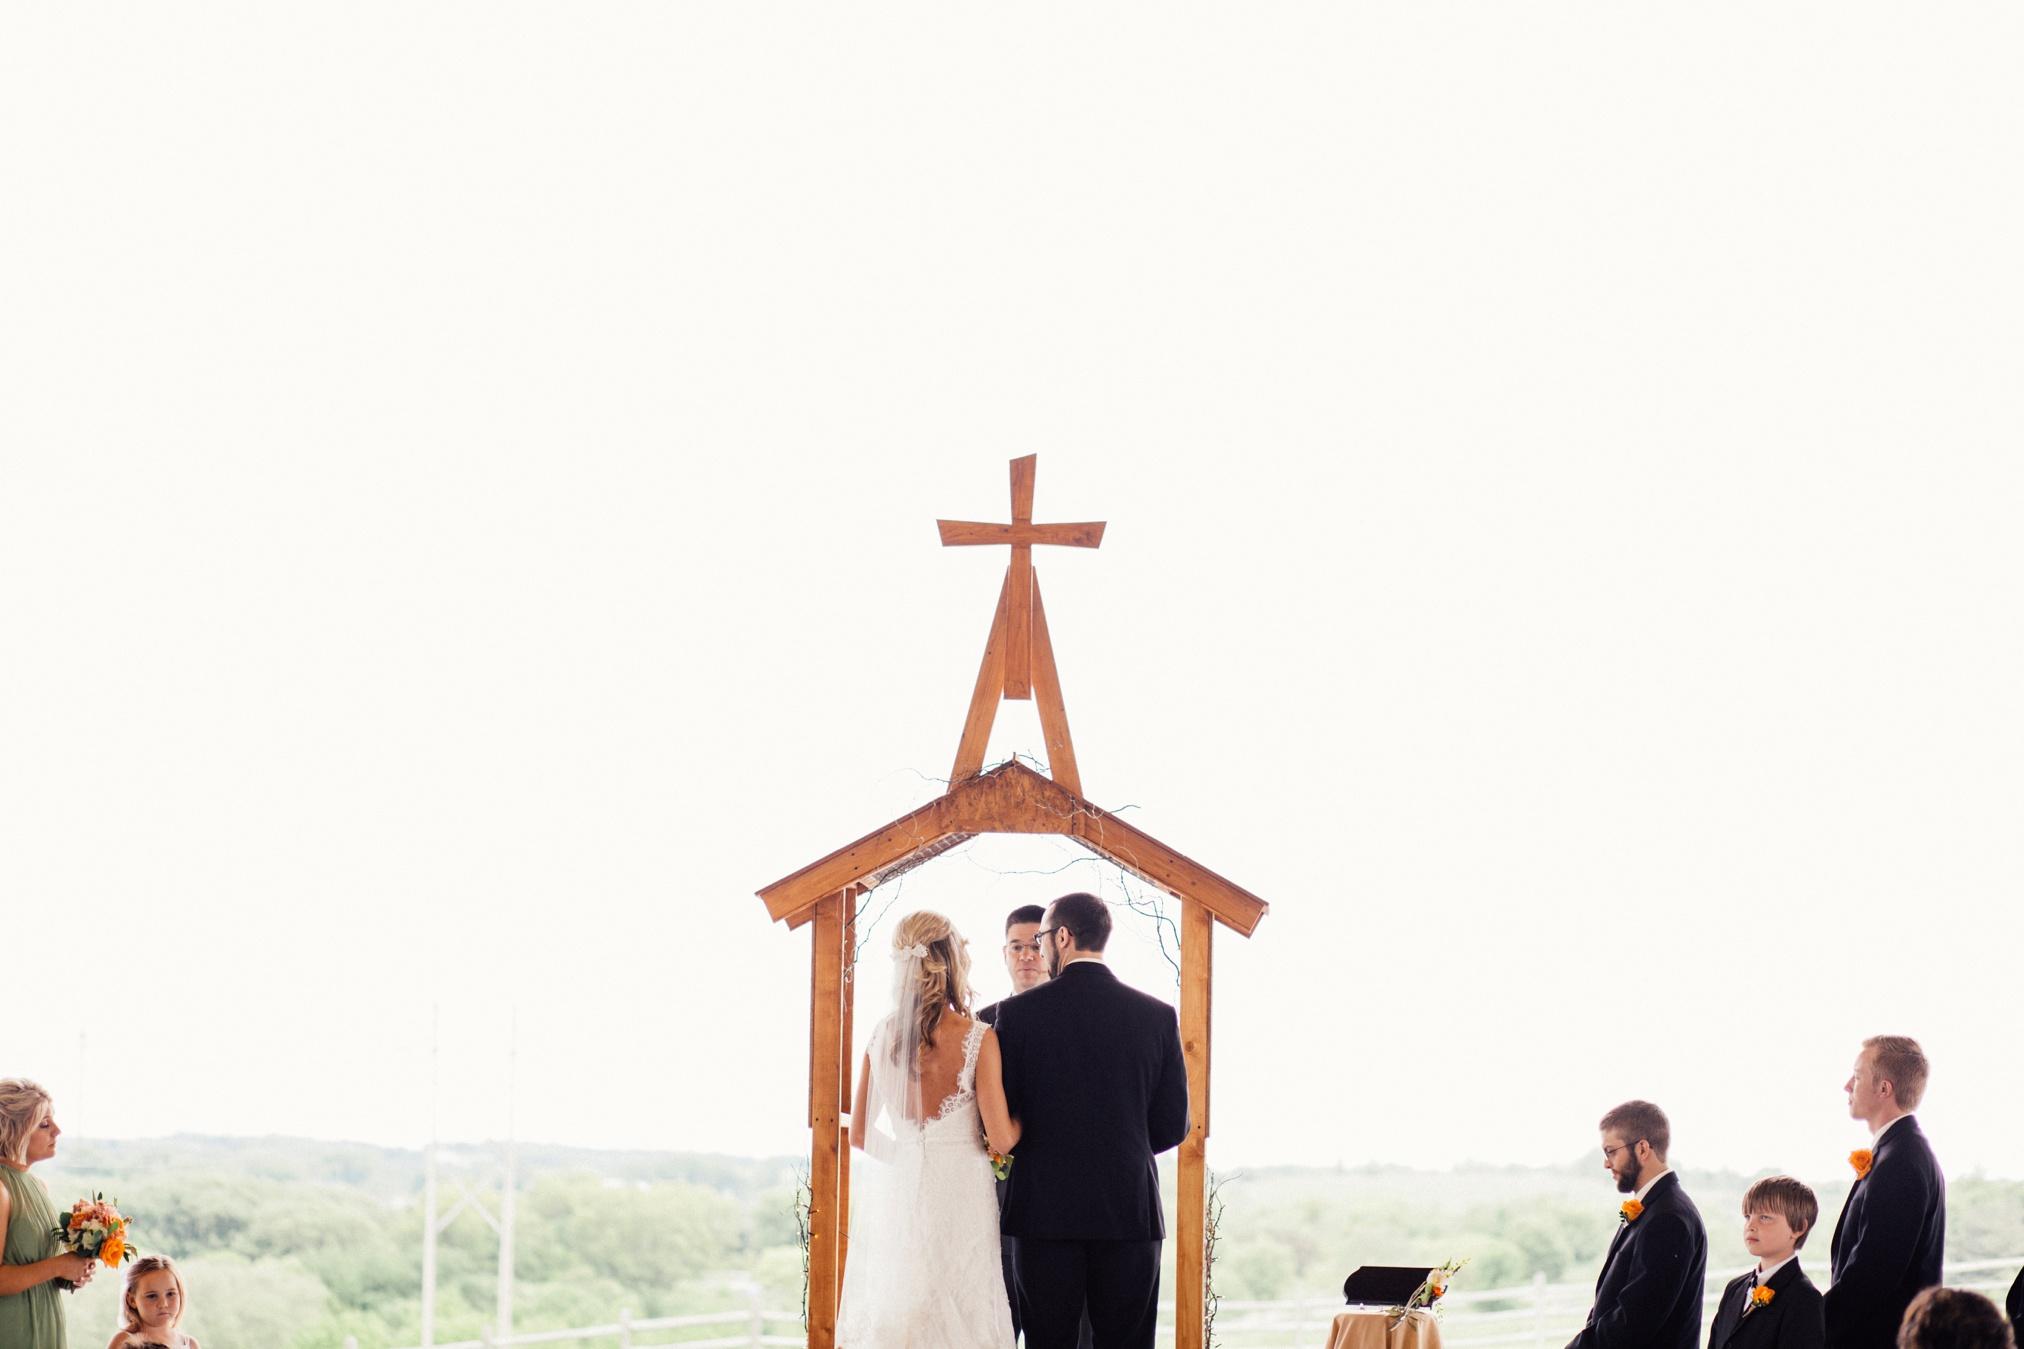 schmid_wedding-410.jpg